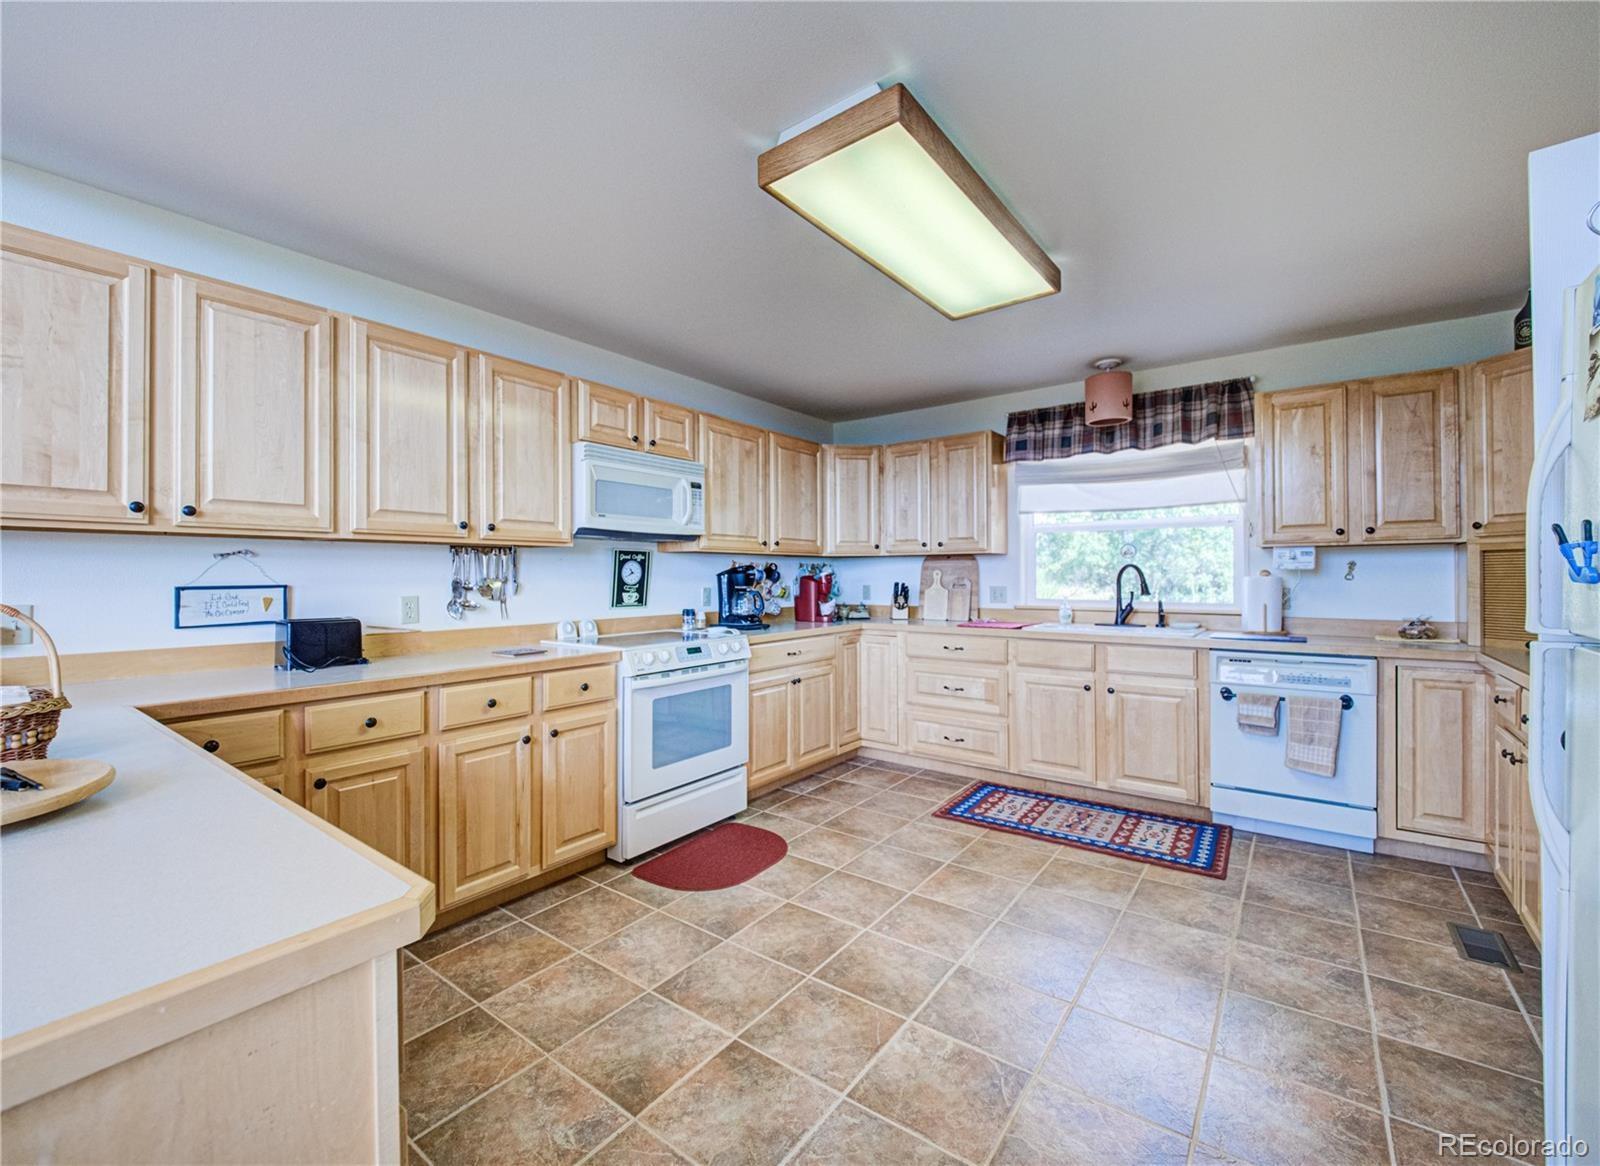 MLS# 3332968 - 10 - 296 Cedar Bluff Drive, Cotopaxi, CO 81223